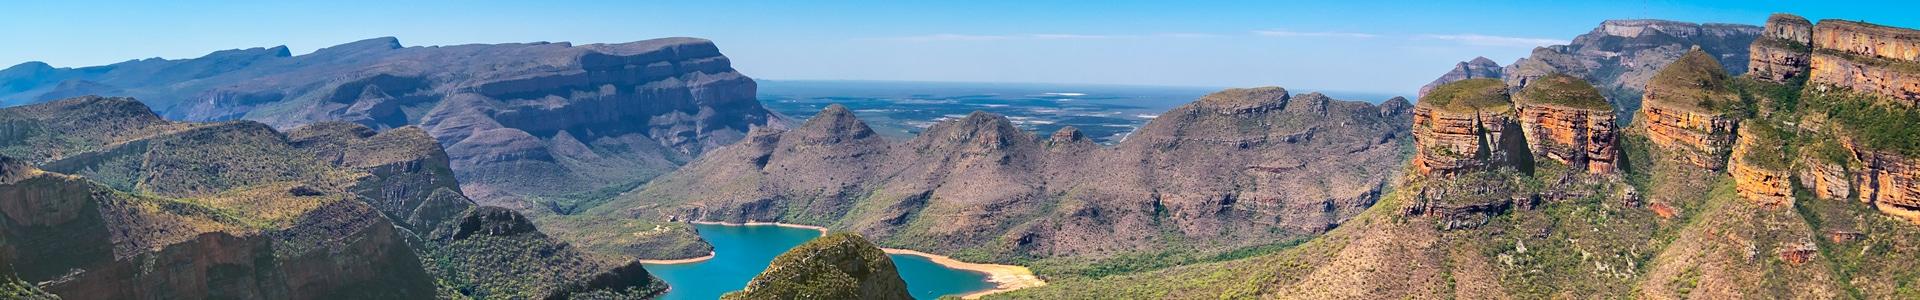 Reis naar Zuid-Afrika